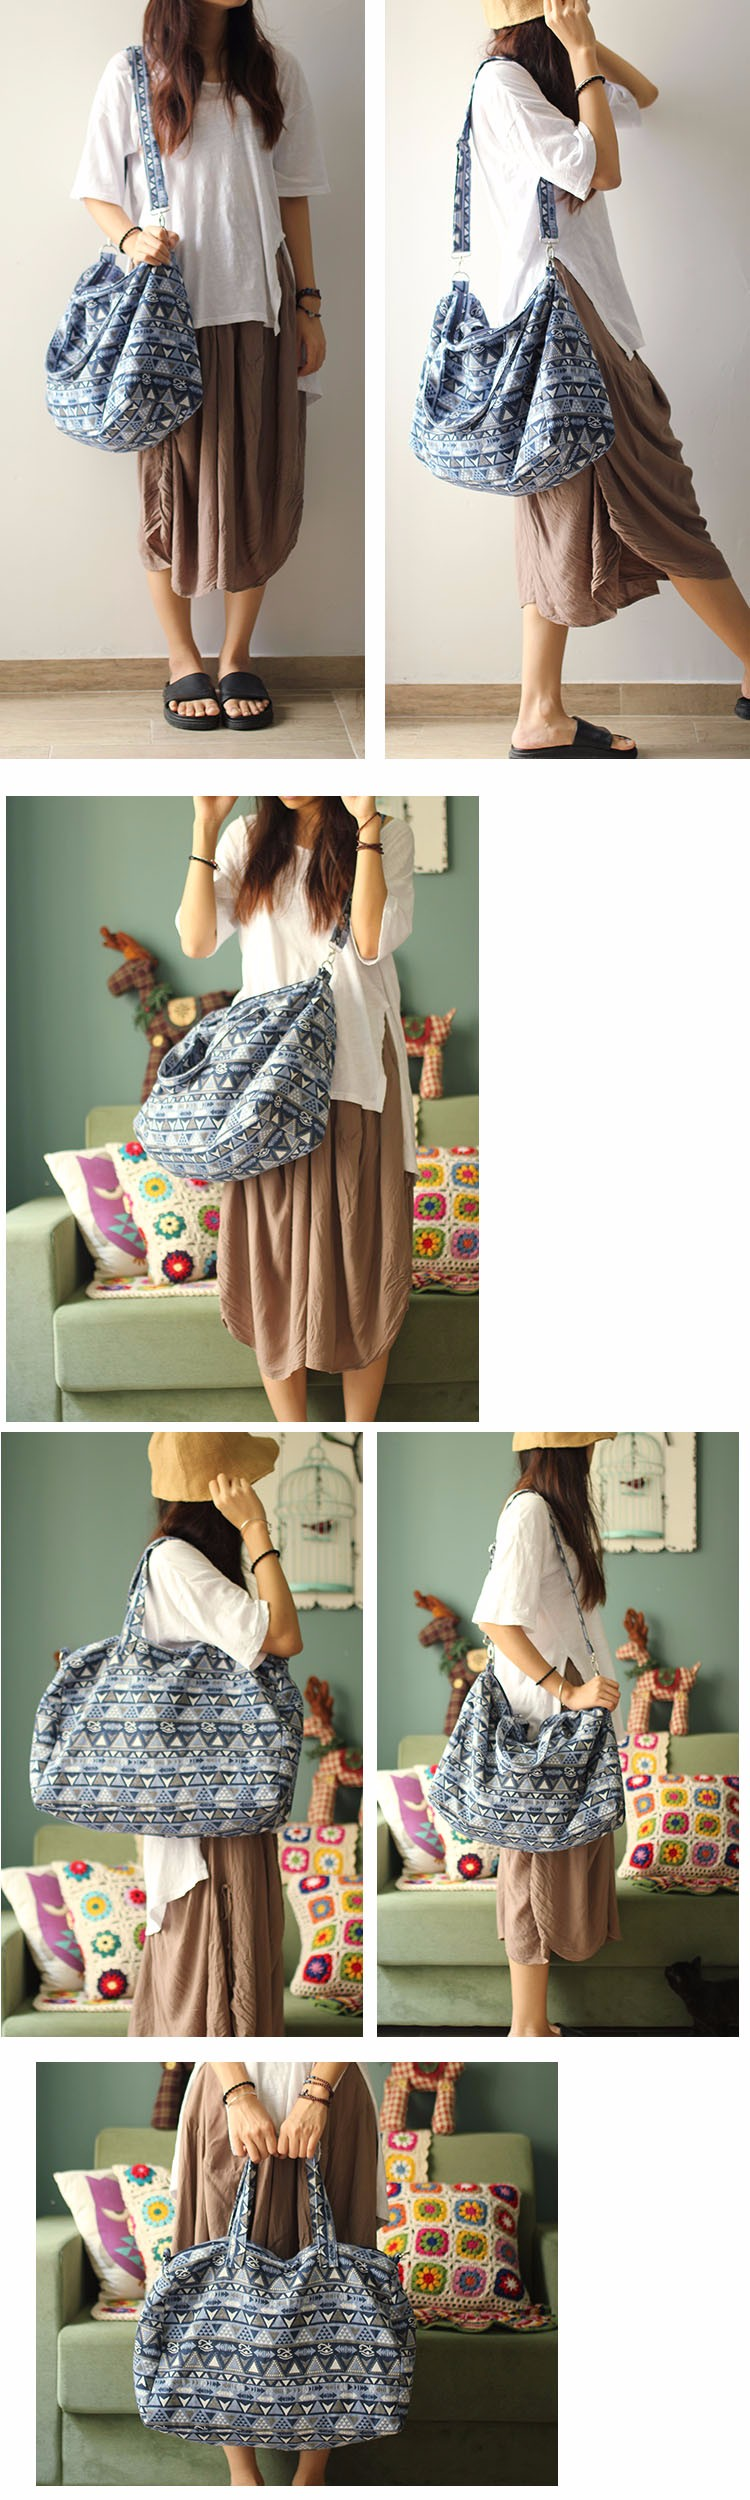 Canvas Leather Trim Travel Tote Duffel shoulder handbag Weekend Bag (6)